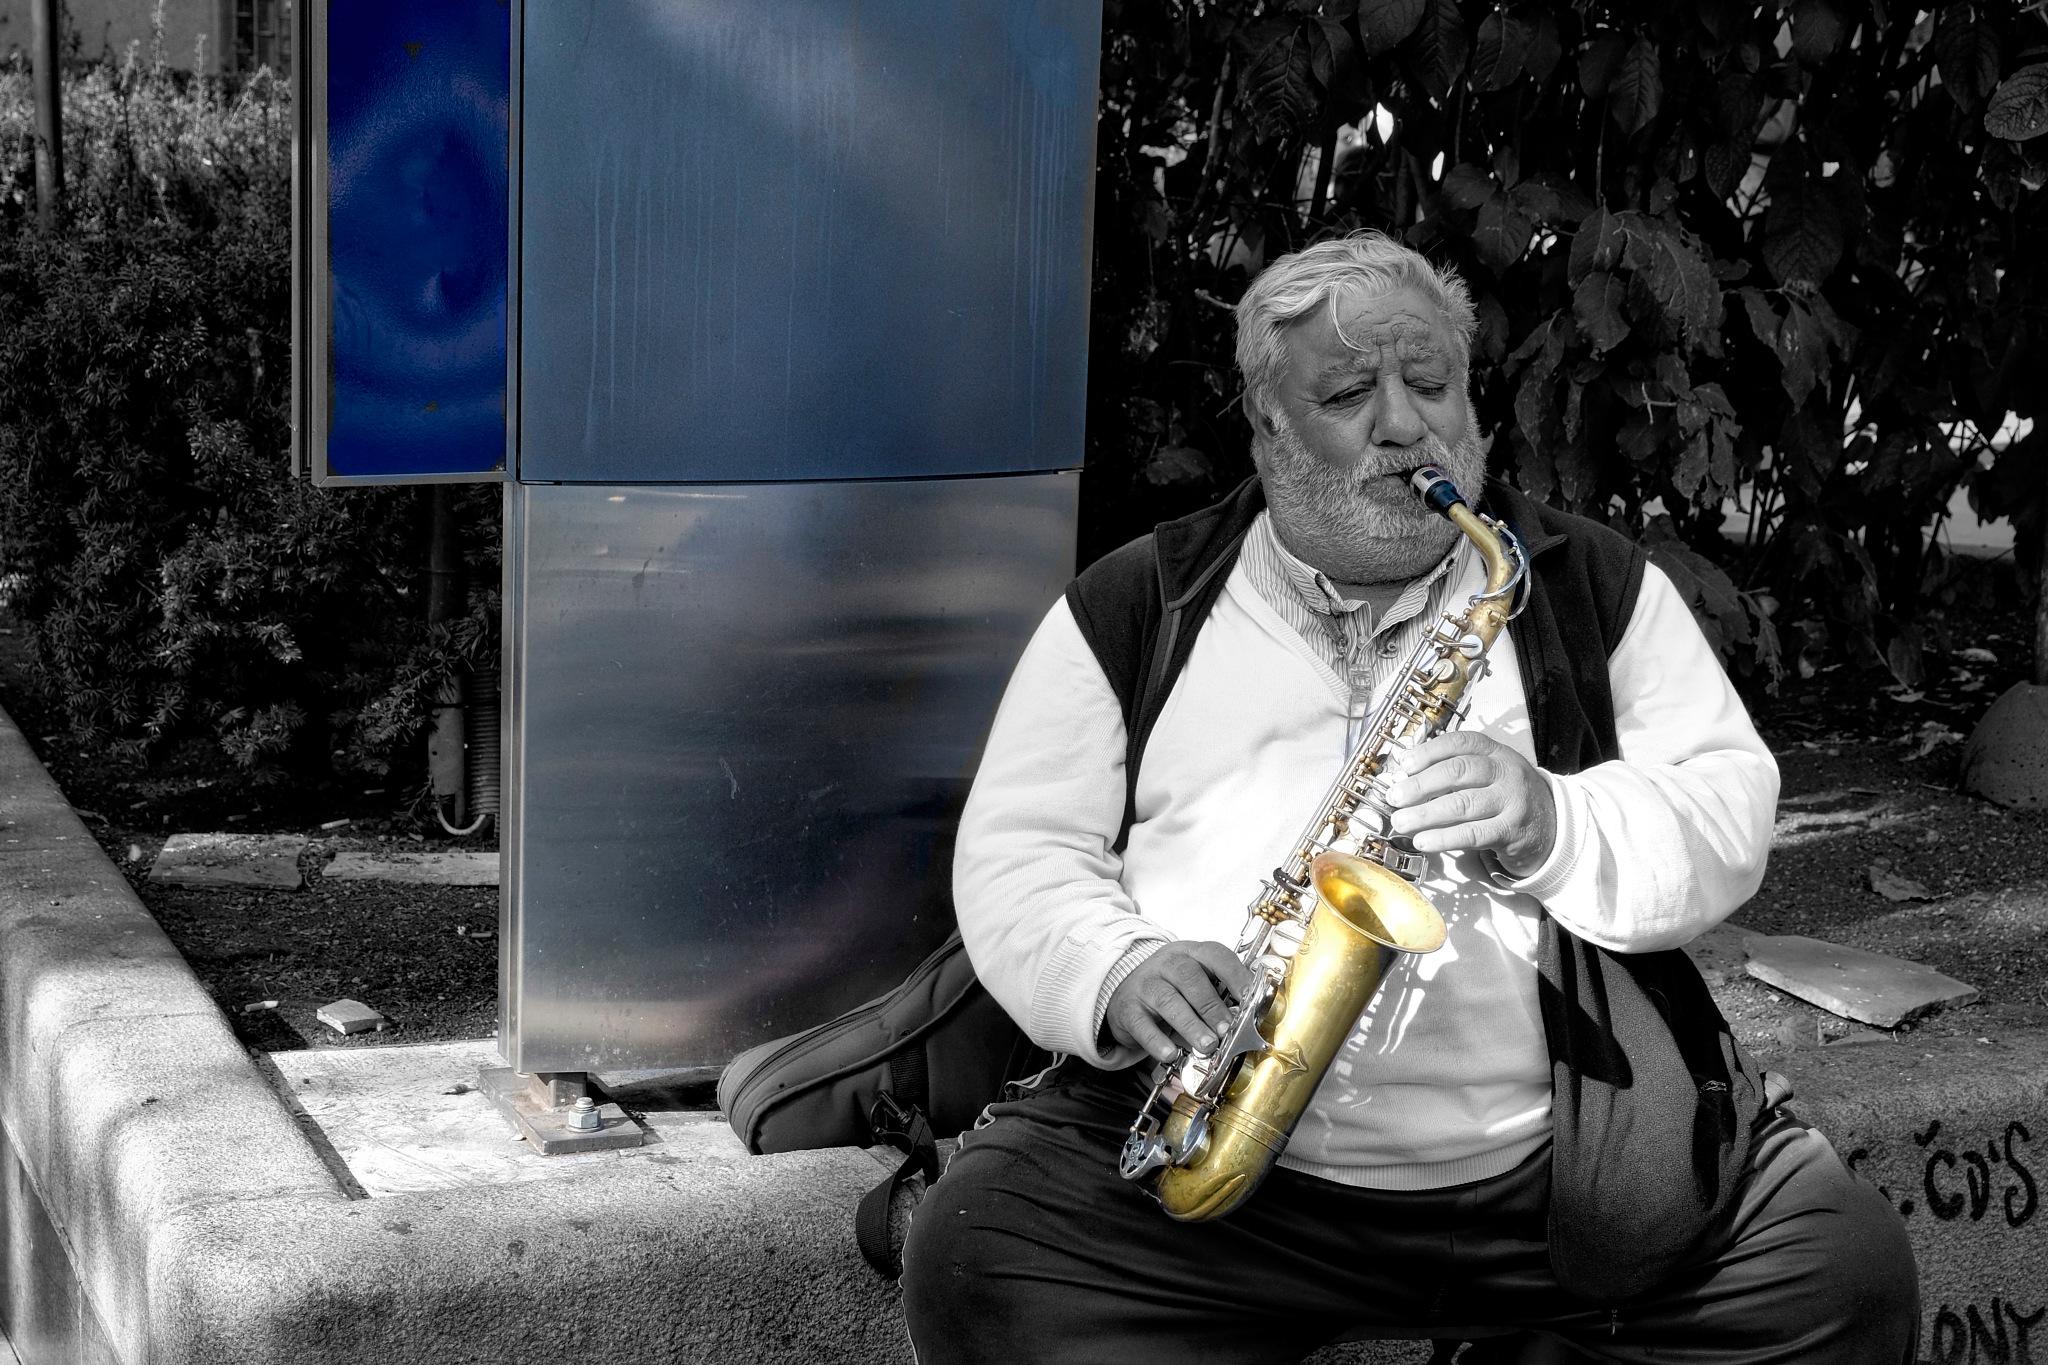 The Man with Golden Sax by Goran Jorganovich